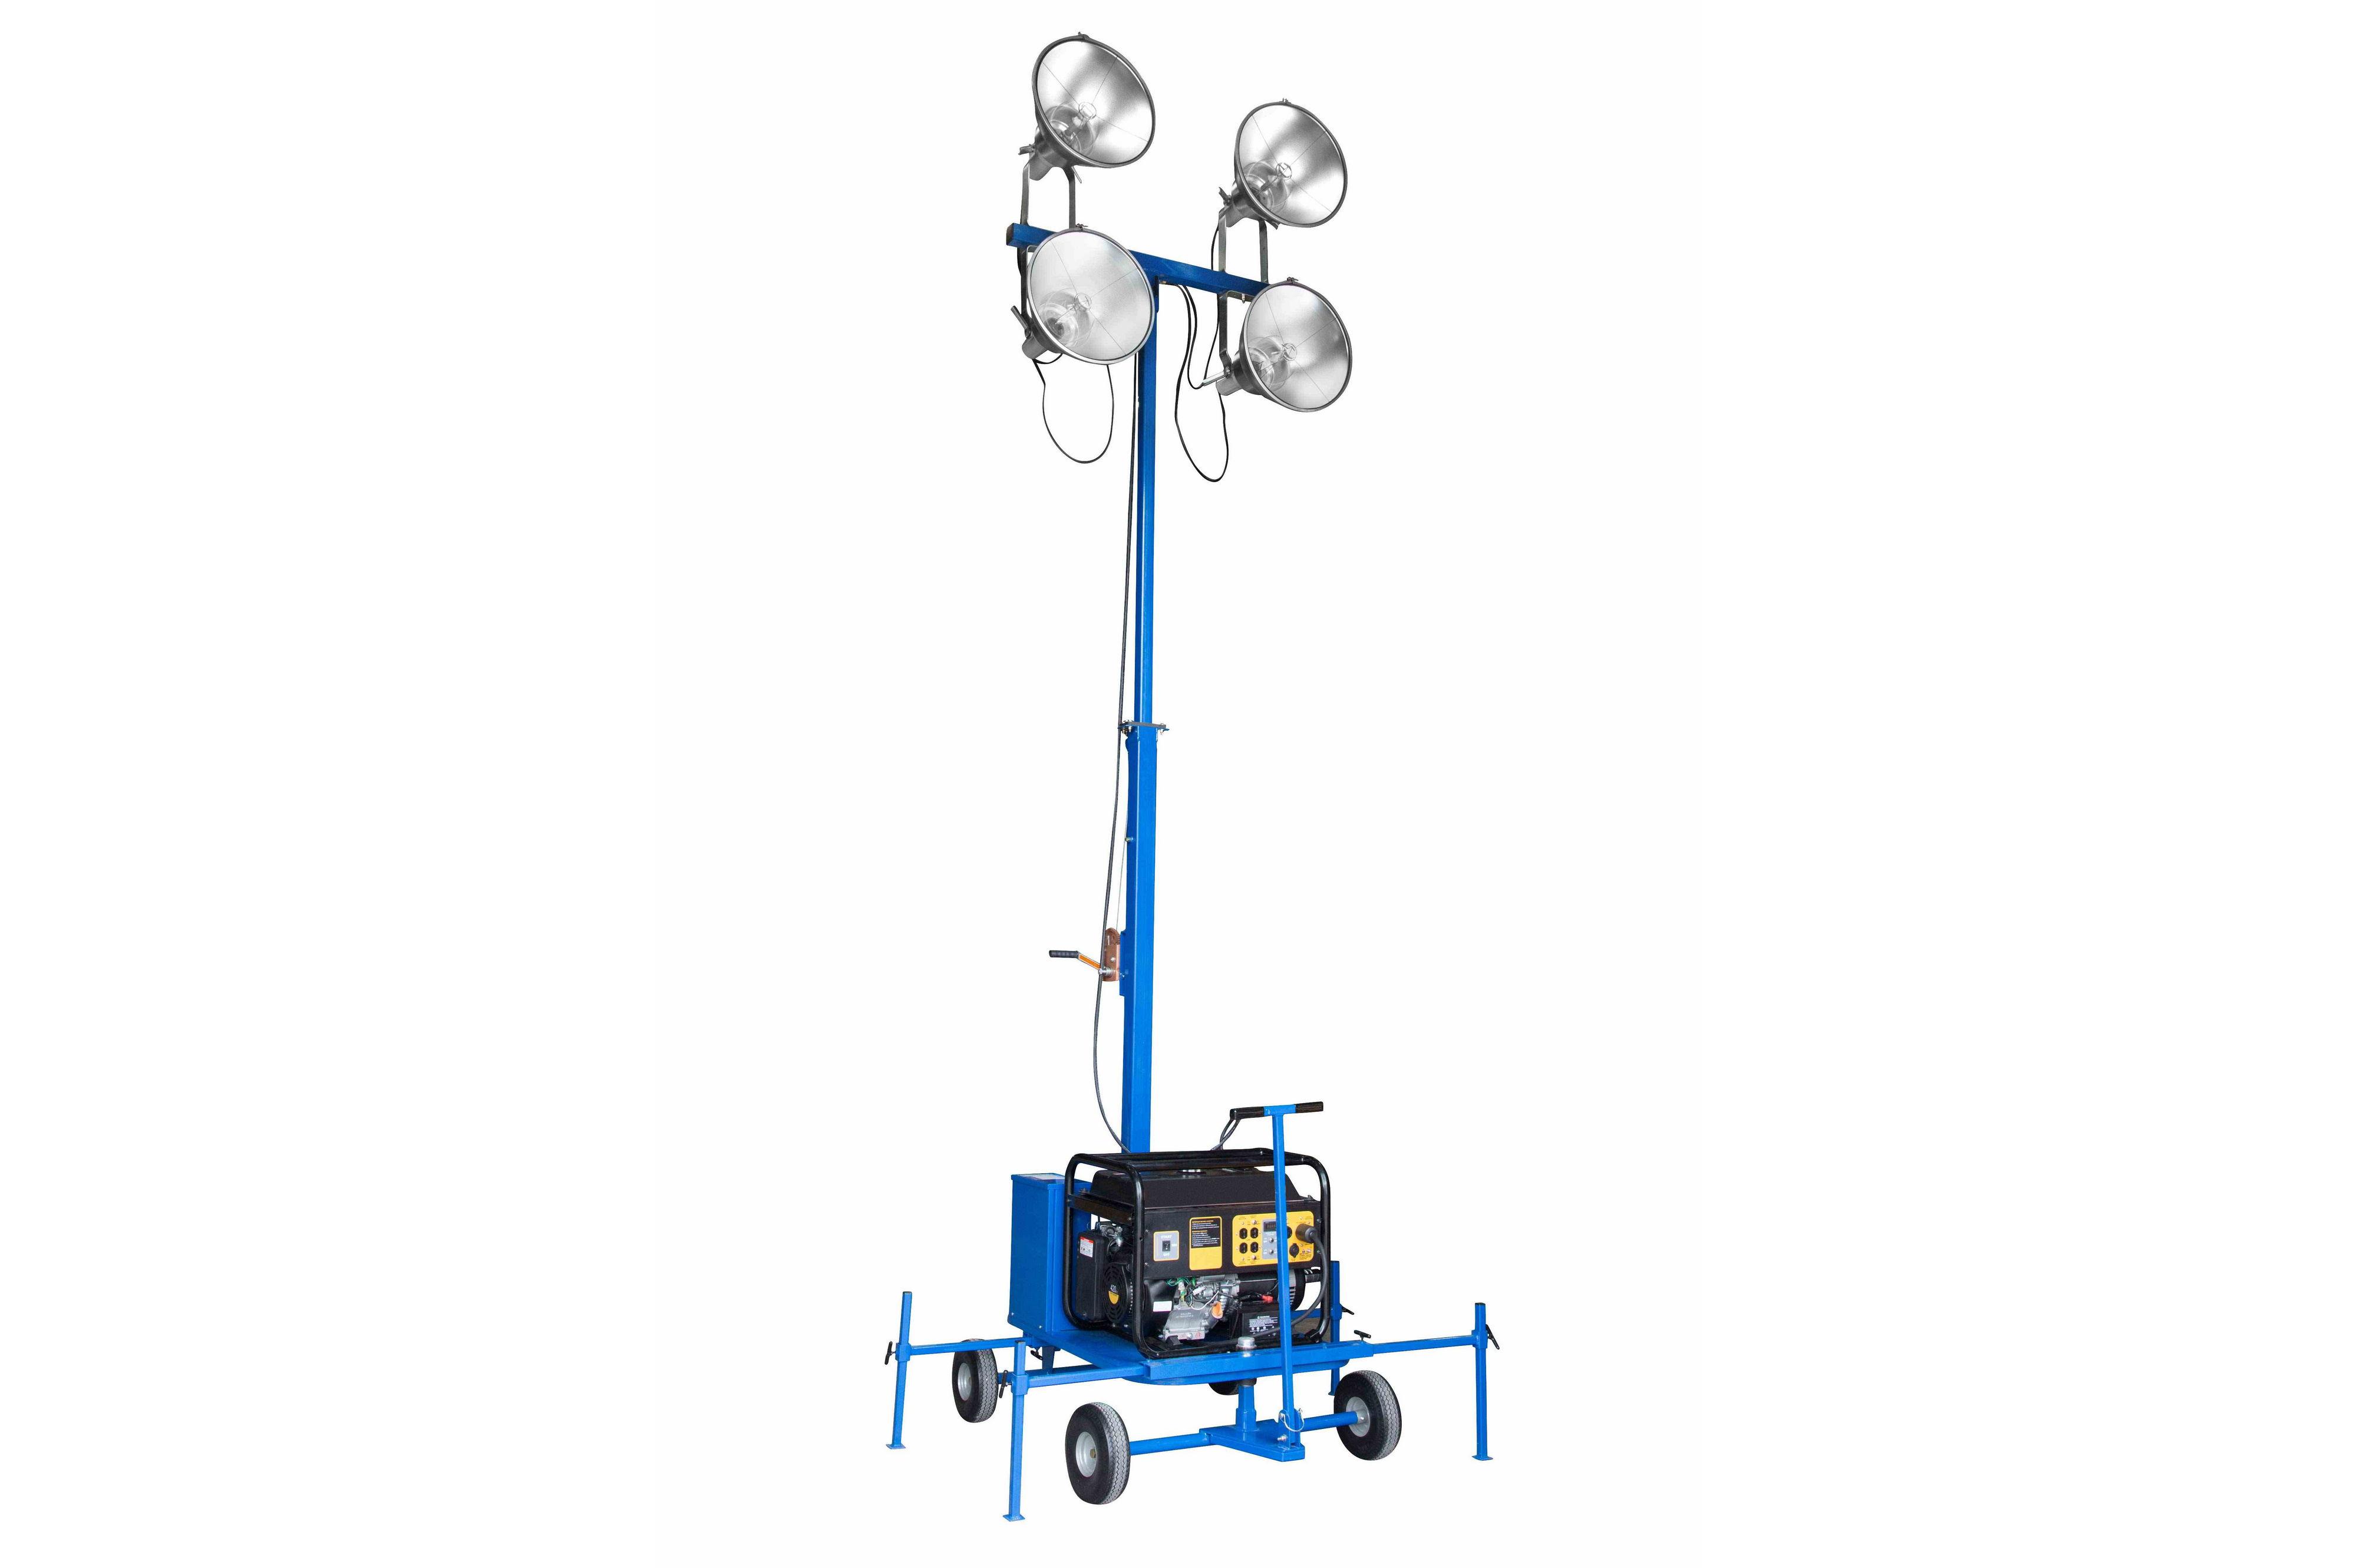 Rental Watt Non Towable Mini Light Tower With